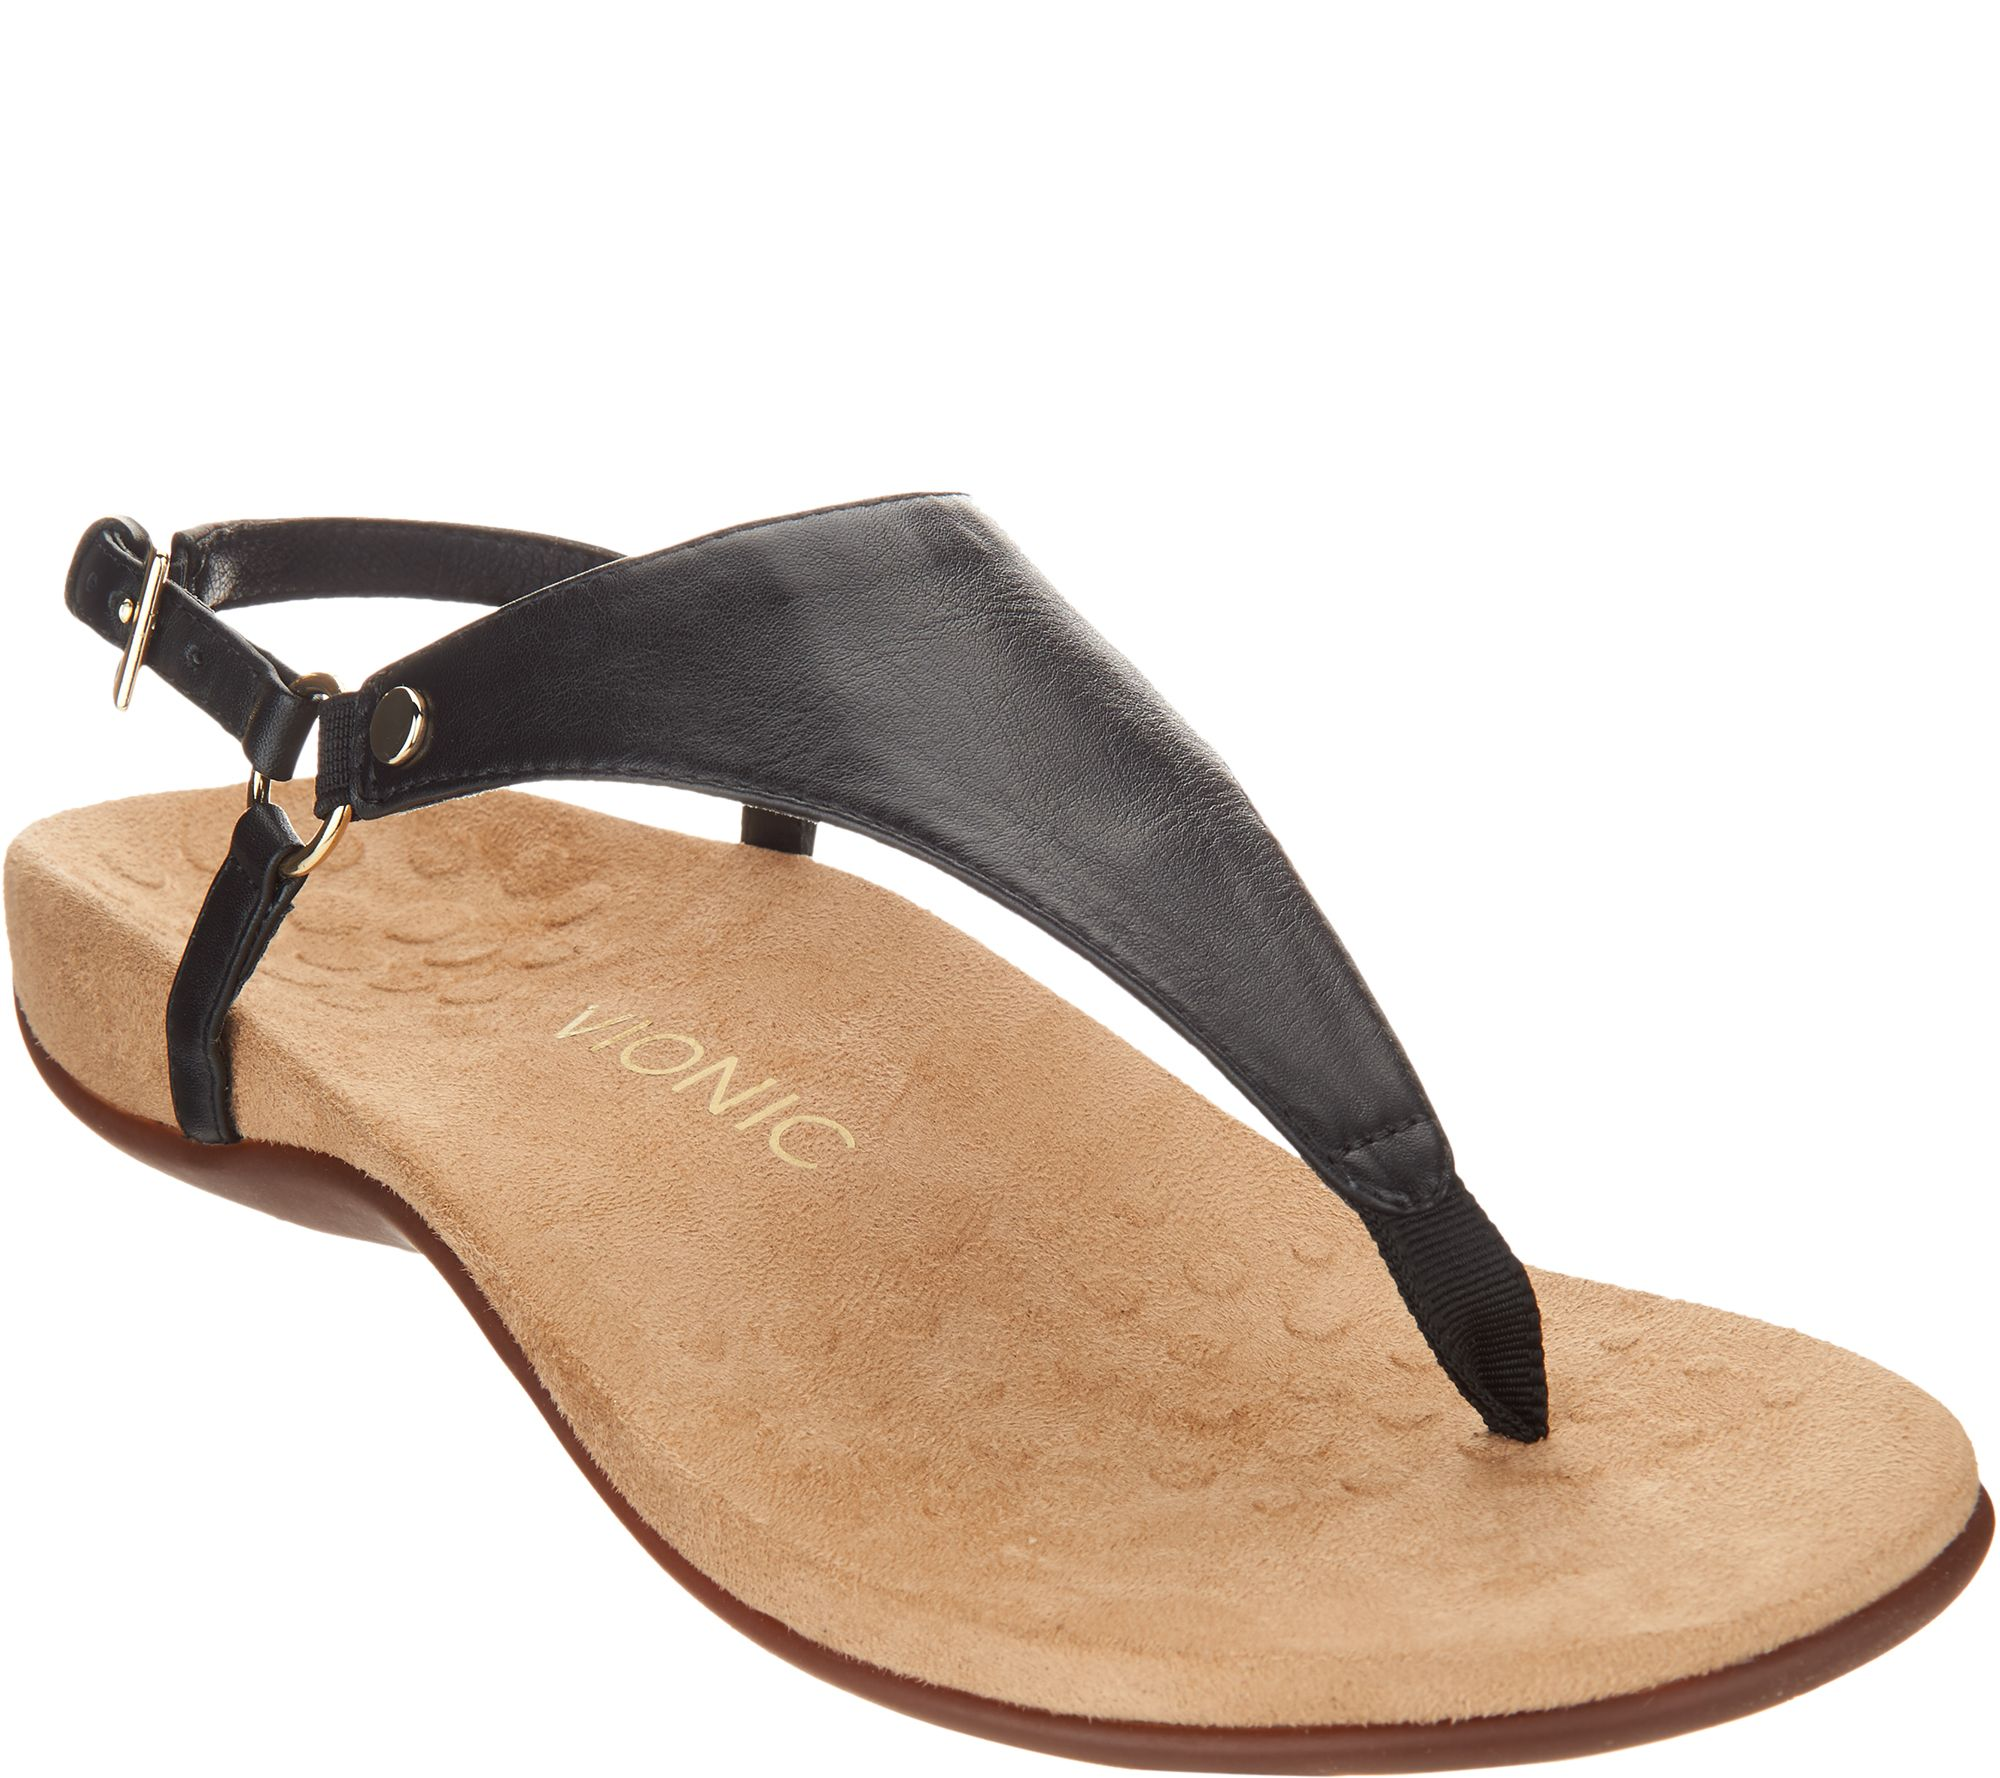 ae2a932104297f Vionic Leather T-Strap Sandals - Kirra - Page 1 — QVC.com